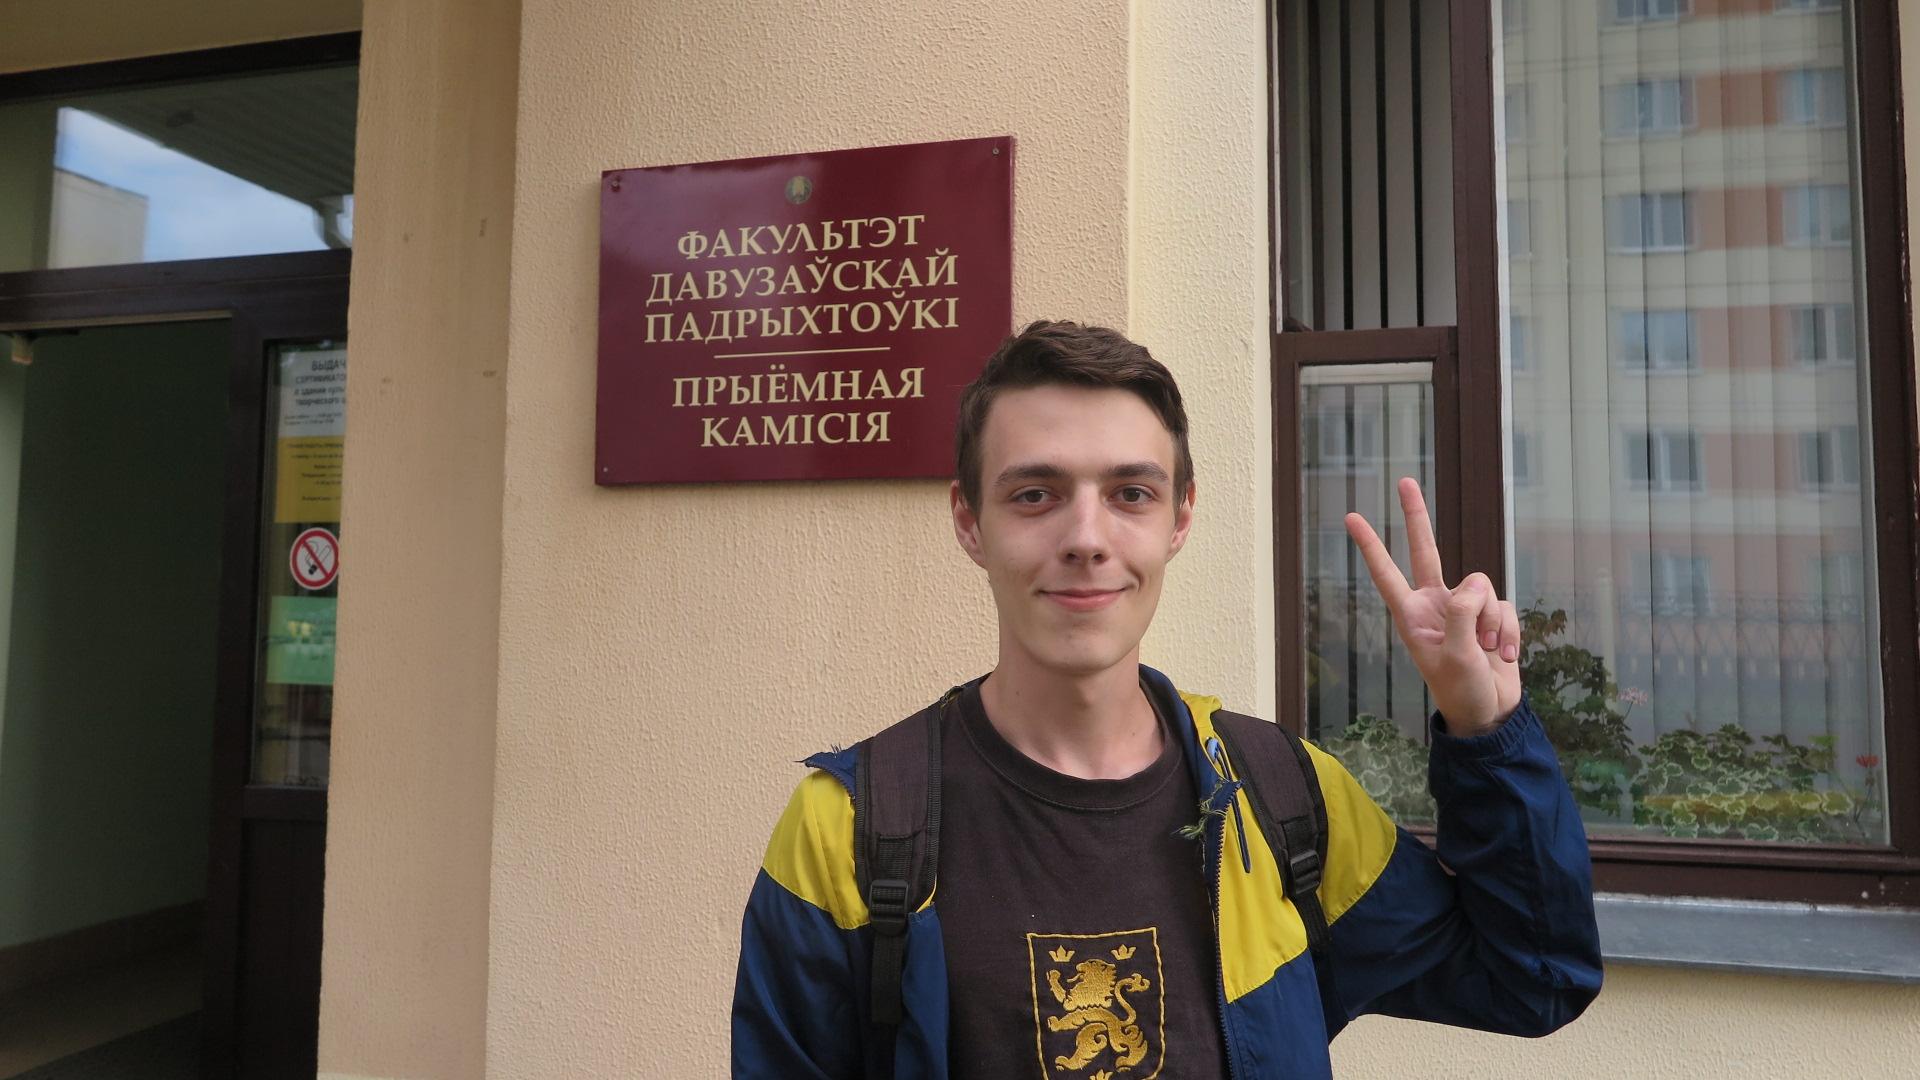 Павел Сергееня. Фото: Ирина КОМИК